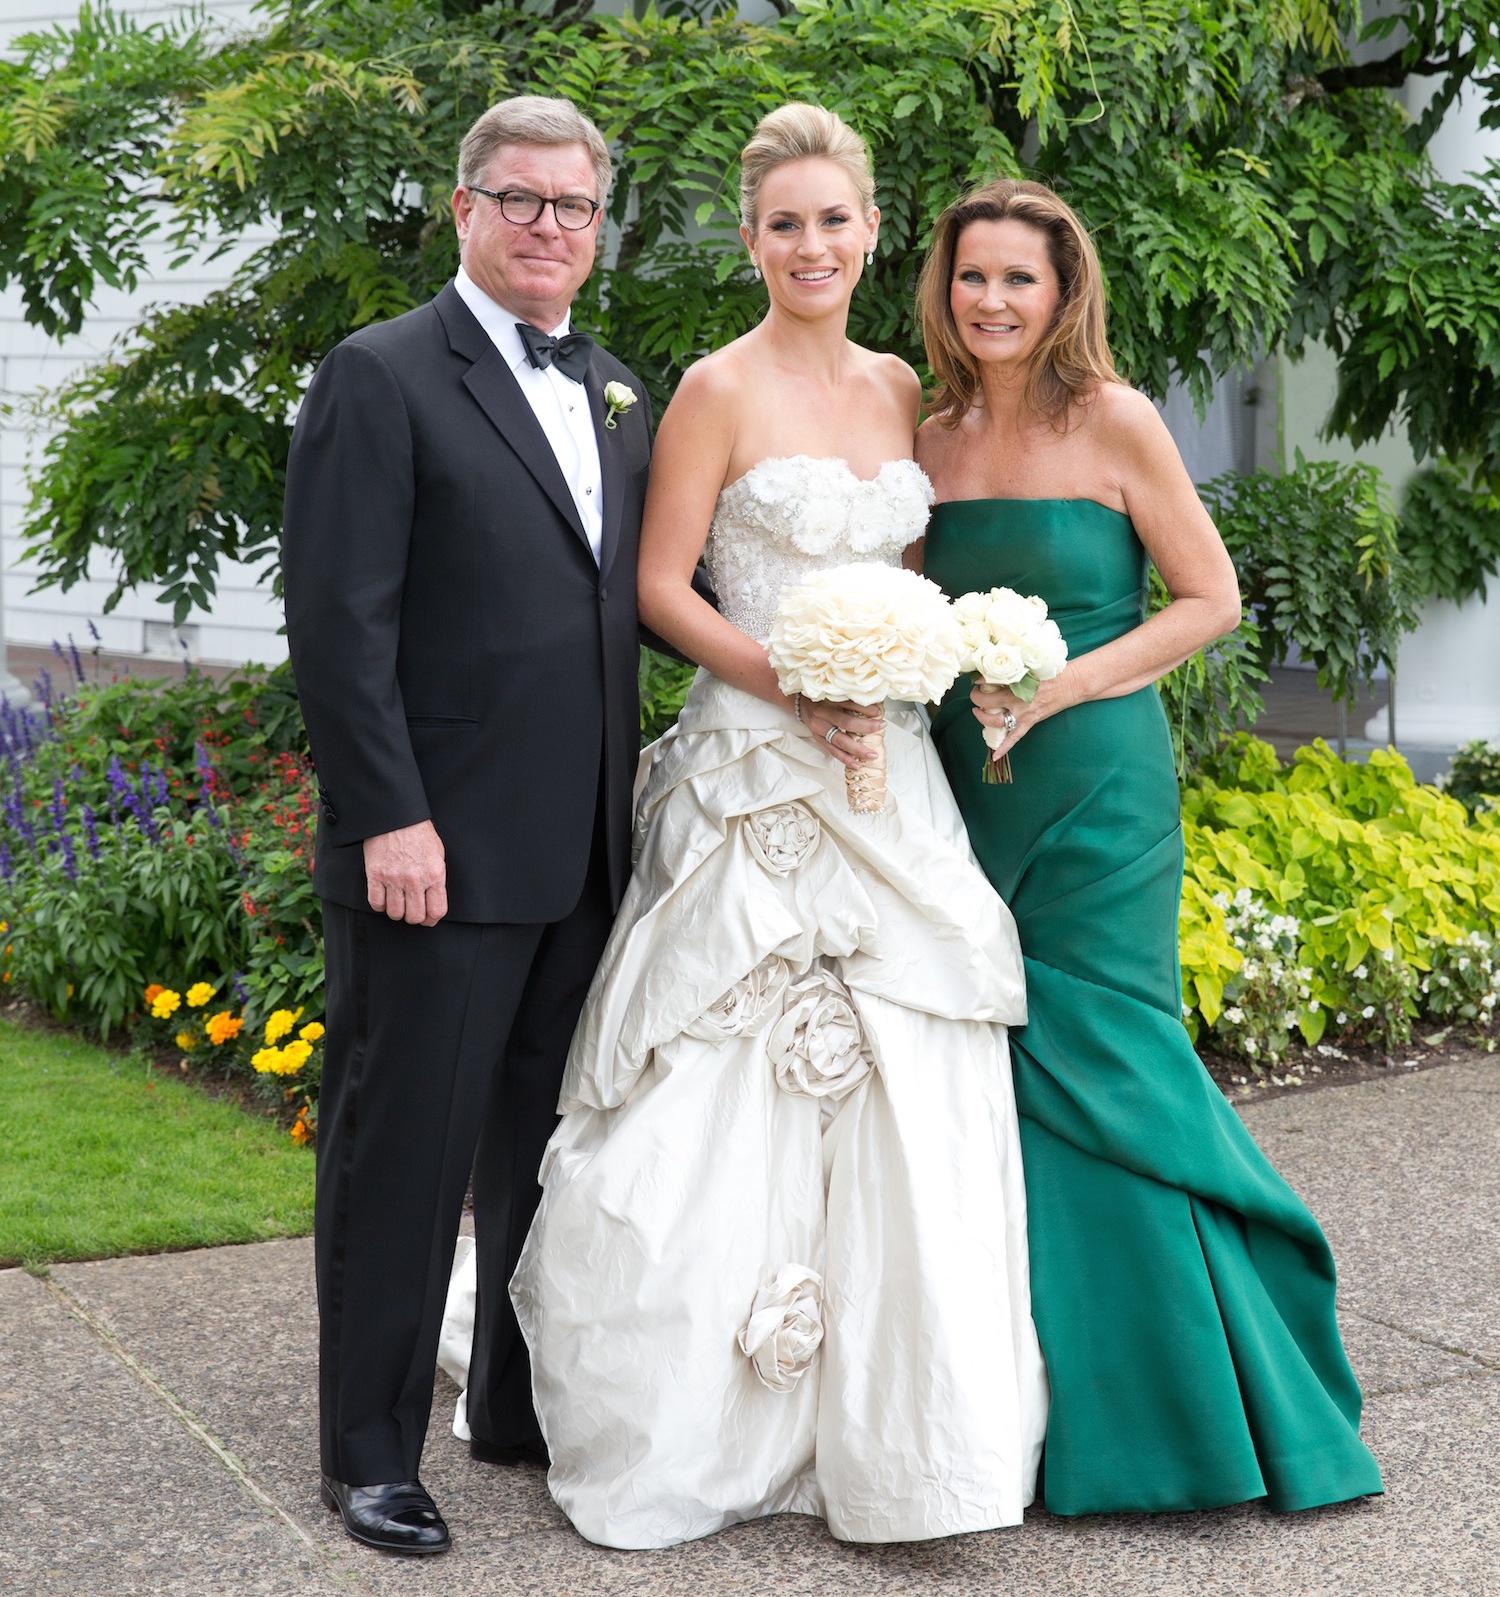 Wedding Color Palette Ideas: Dark Green & Emerald